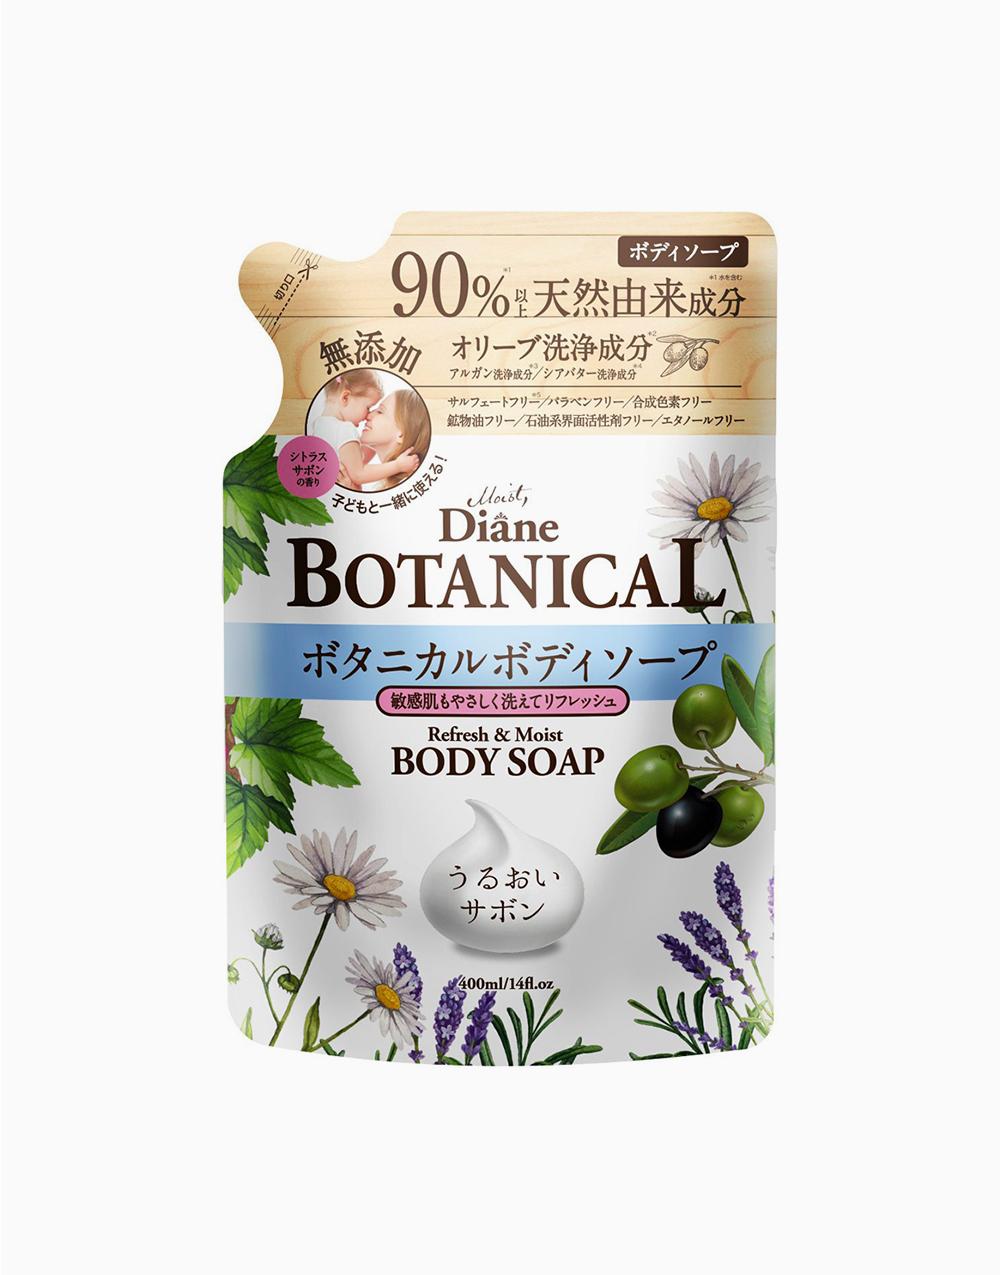 Refresh and Moist Botanical Body Soap Refill by Moist Diane